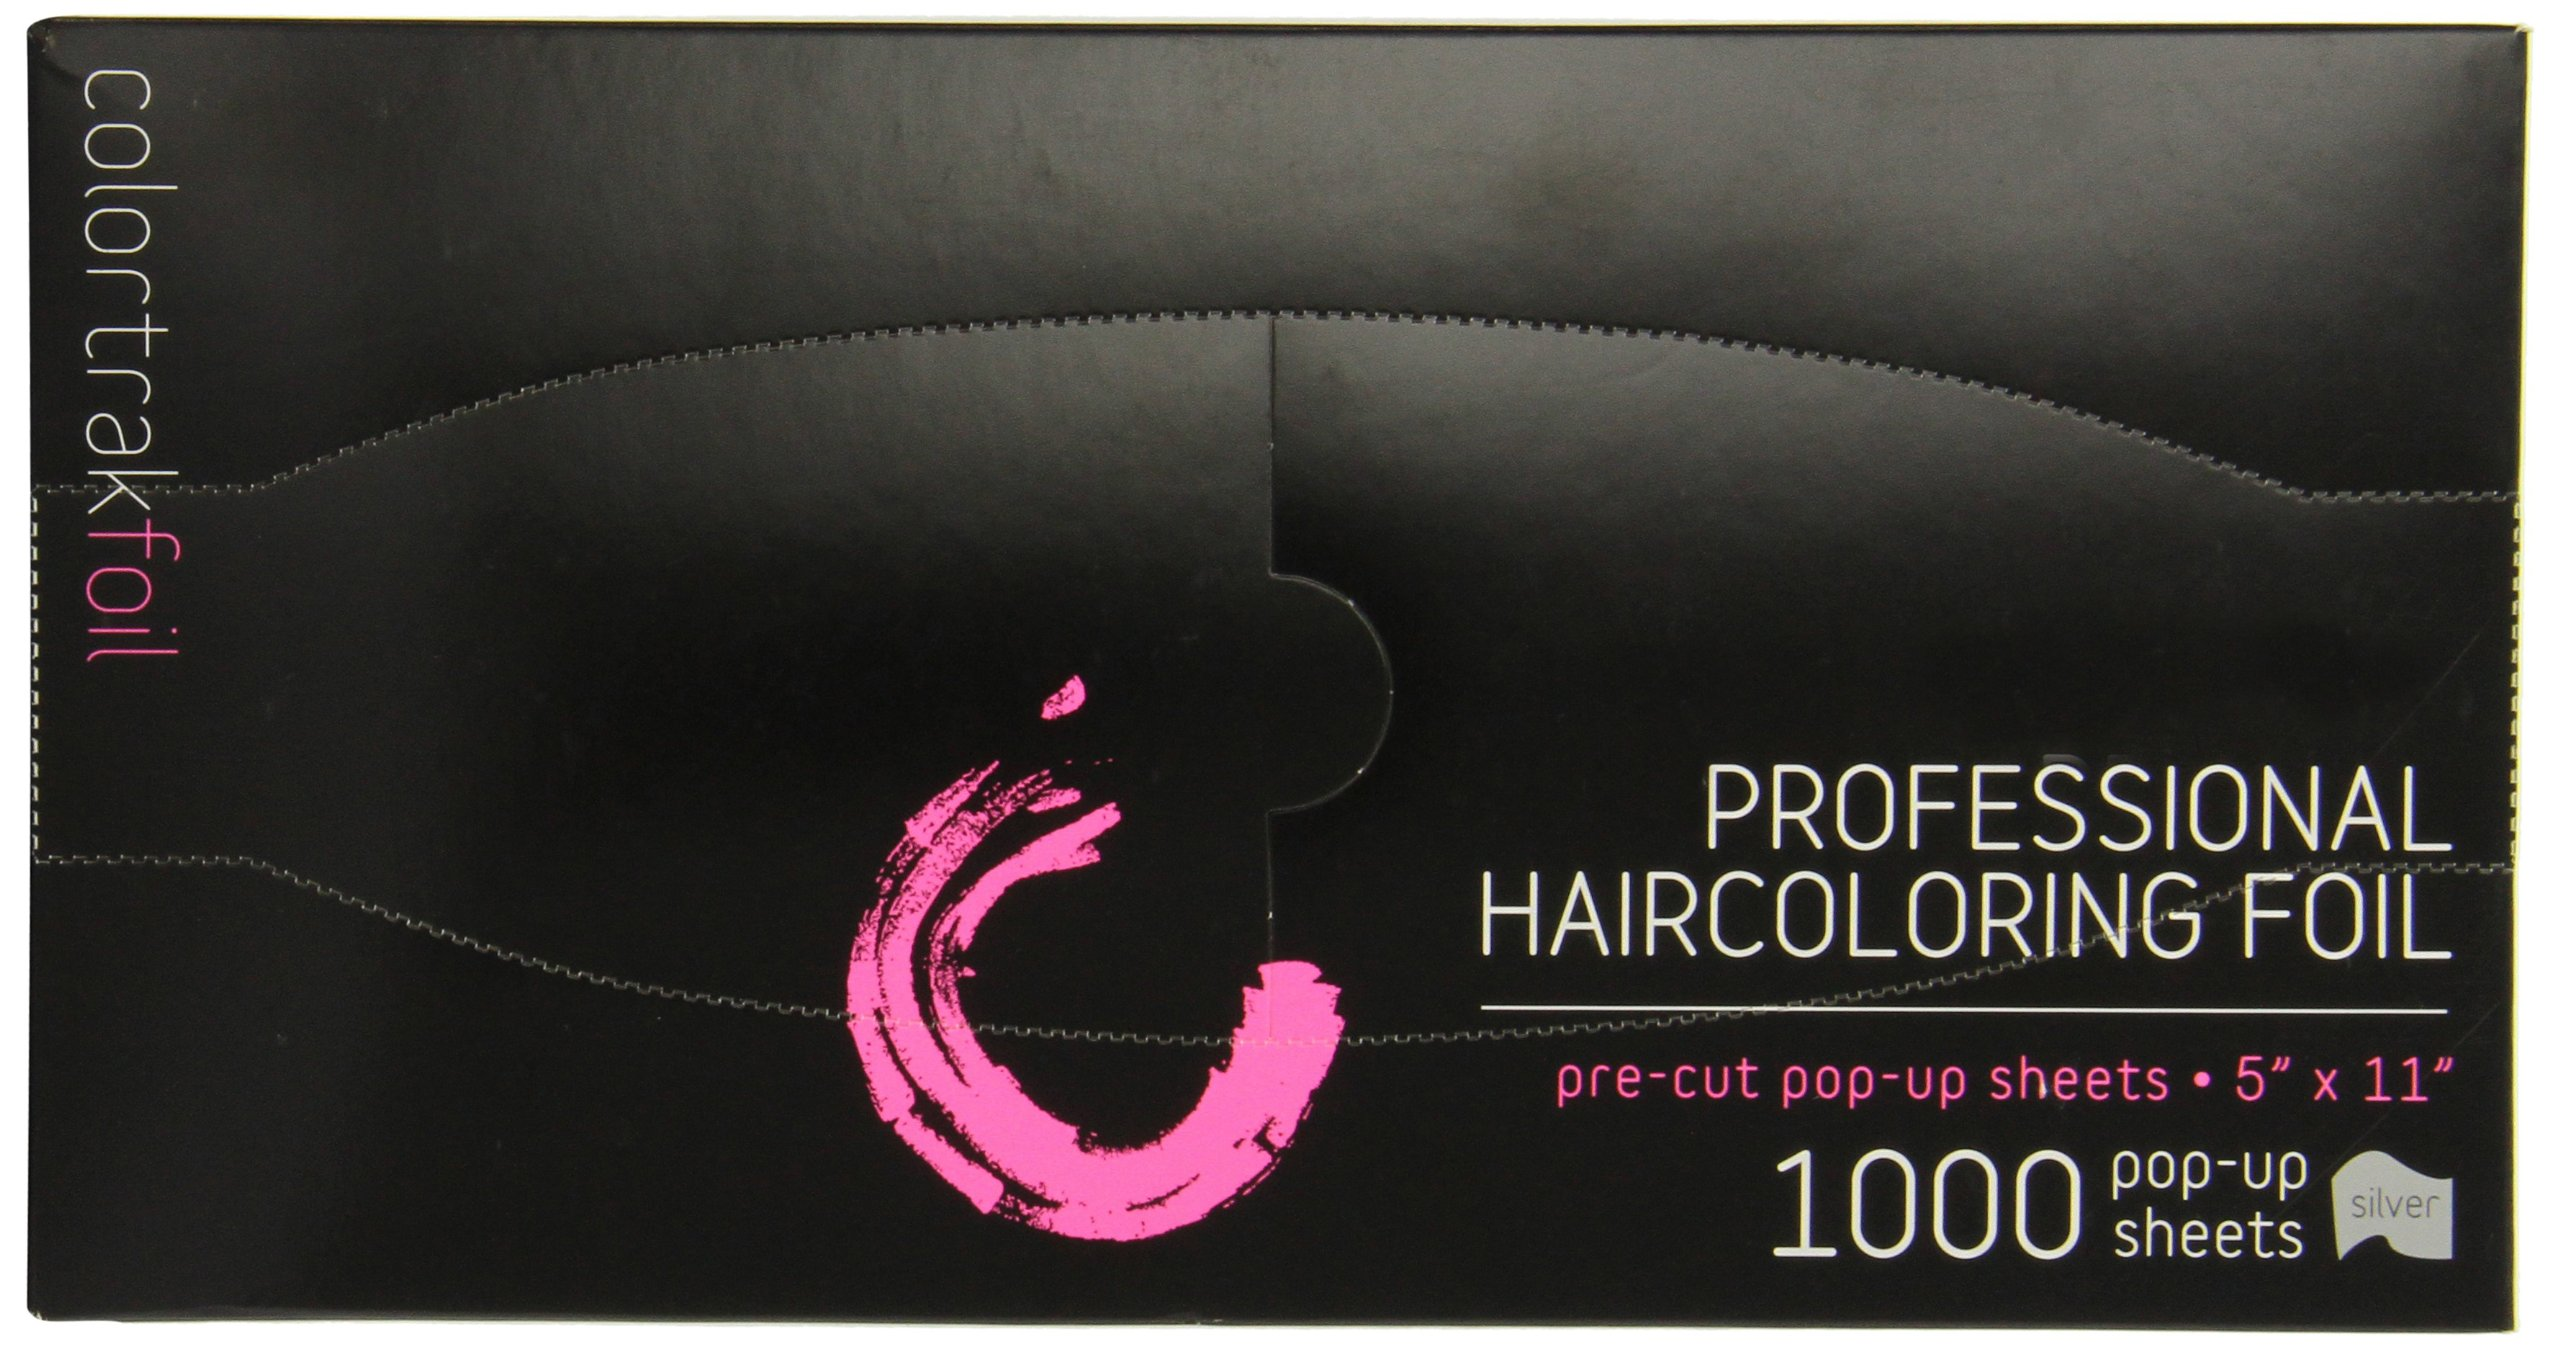 Colortrak Pre-cut Popup Highlighting Foil Sheets, Silver, 1000 sheets 5'' x 11''